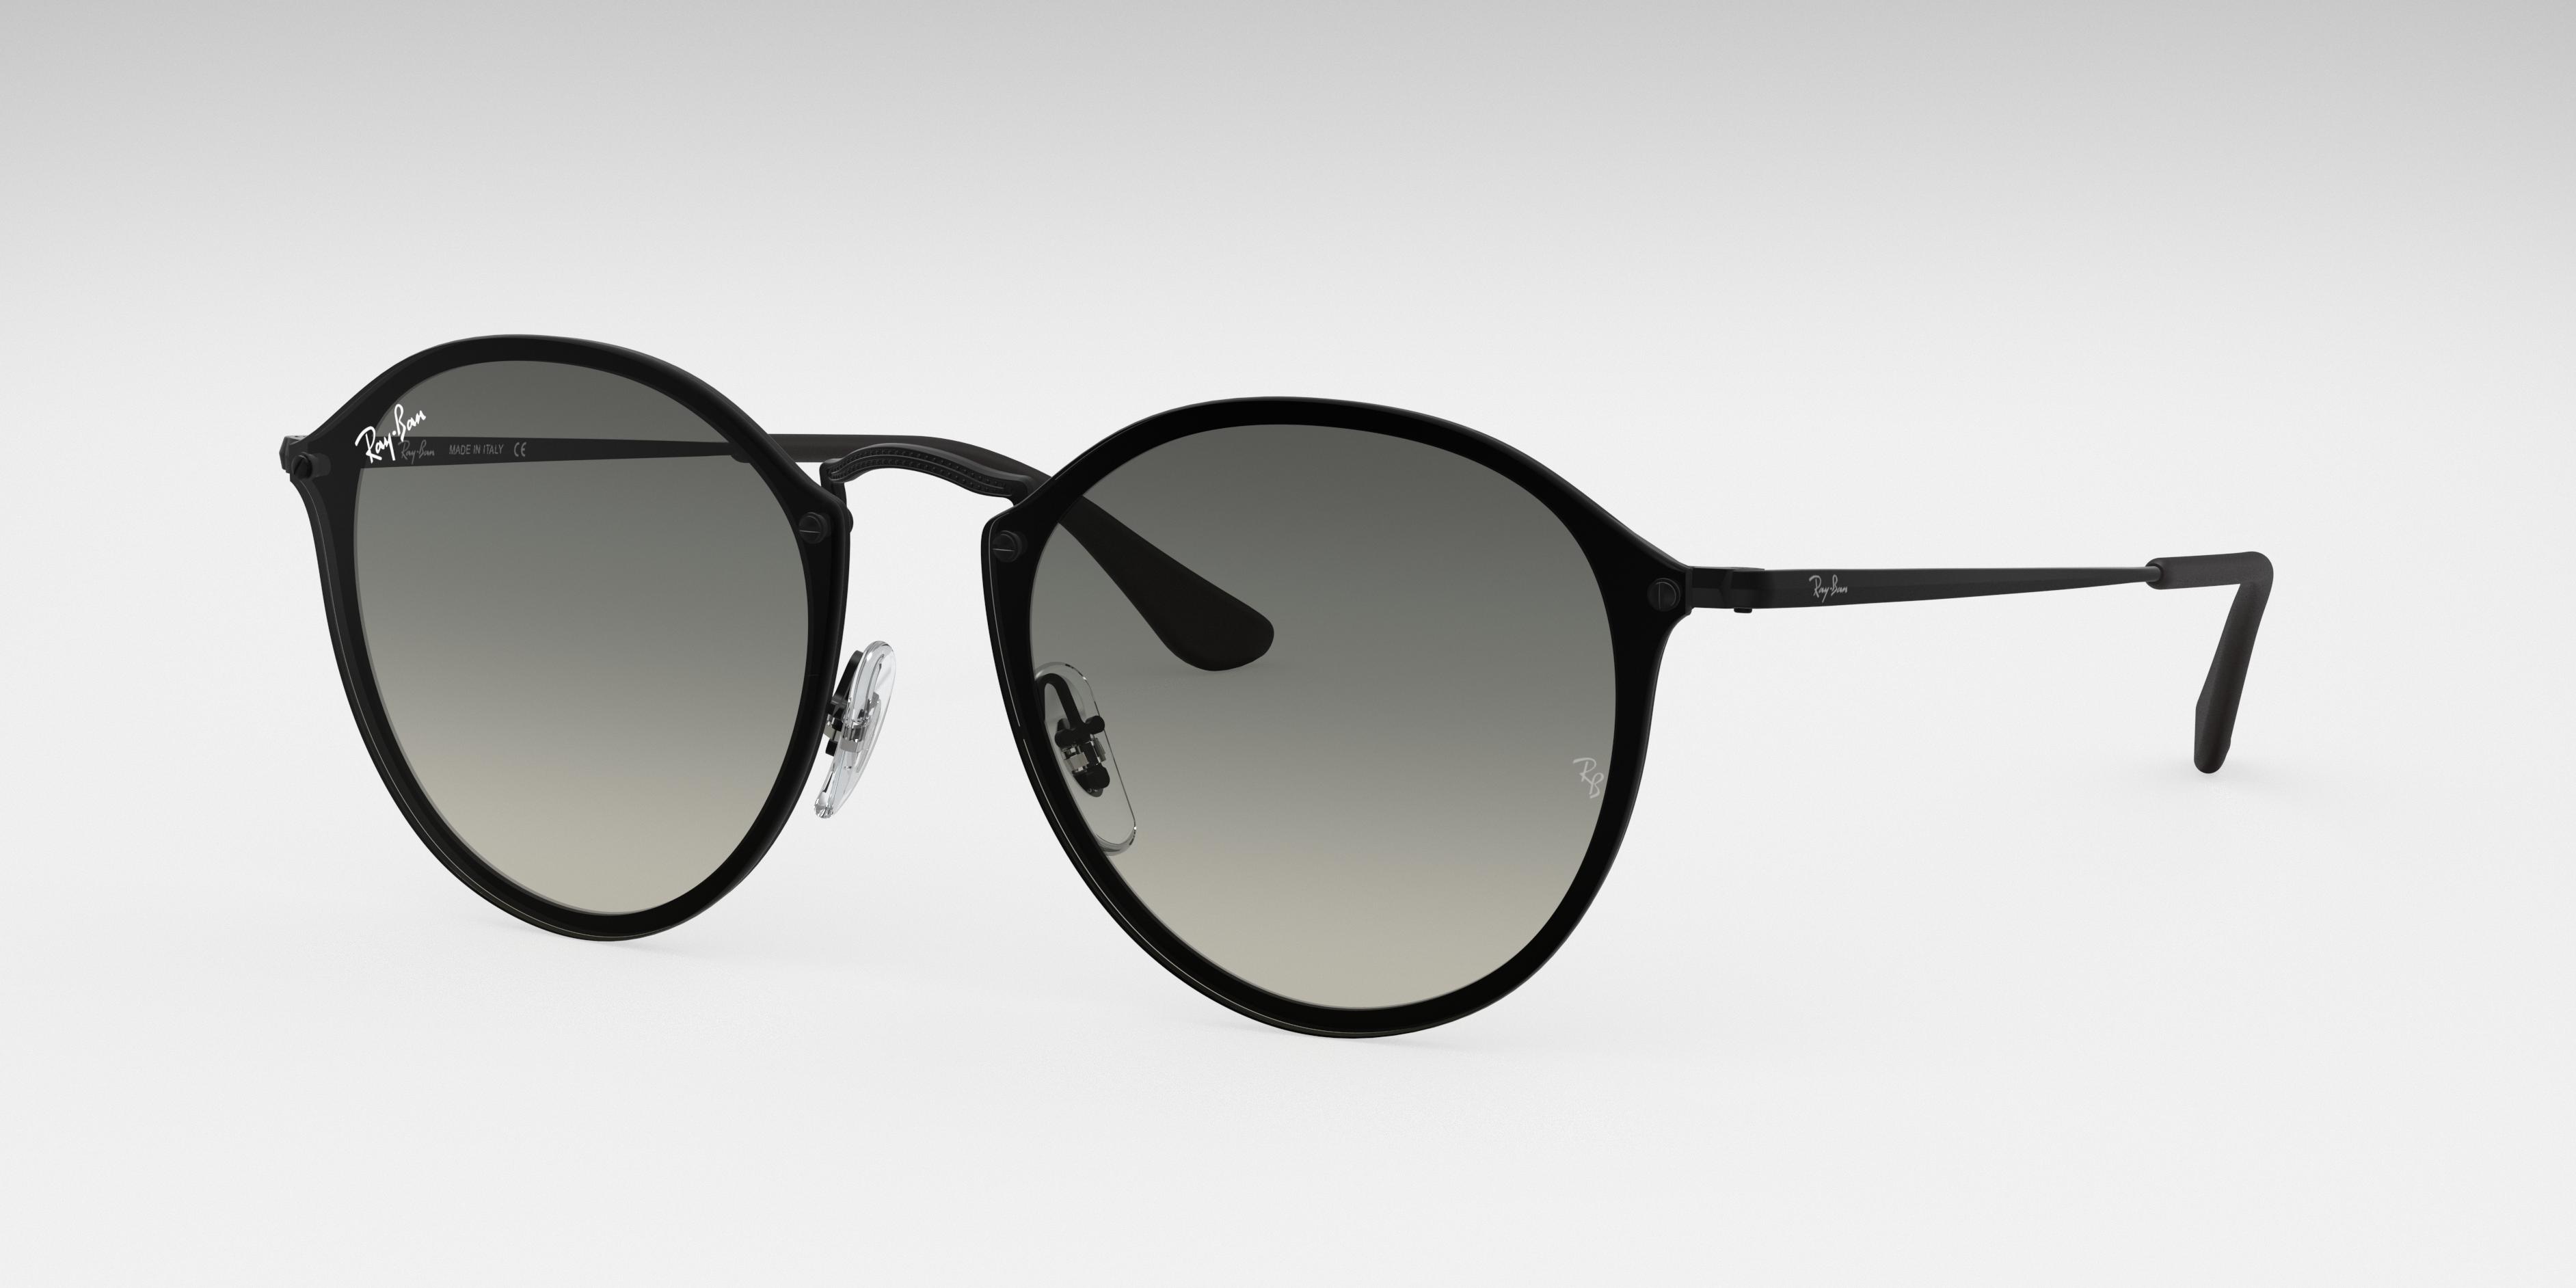 Ray-Ban Blaze Round Black, Gray Lenses - RB3574N